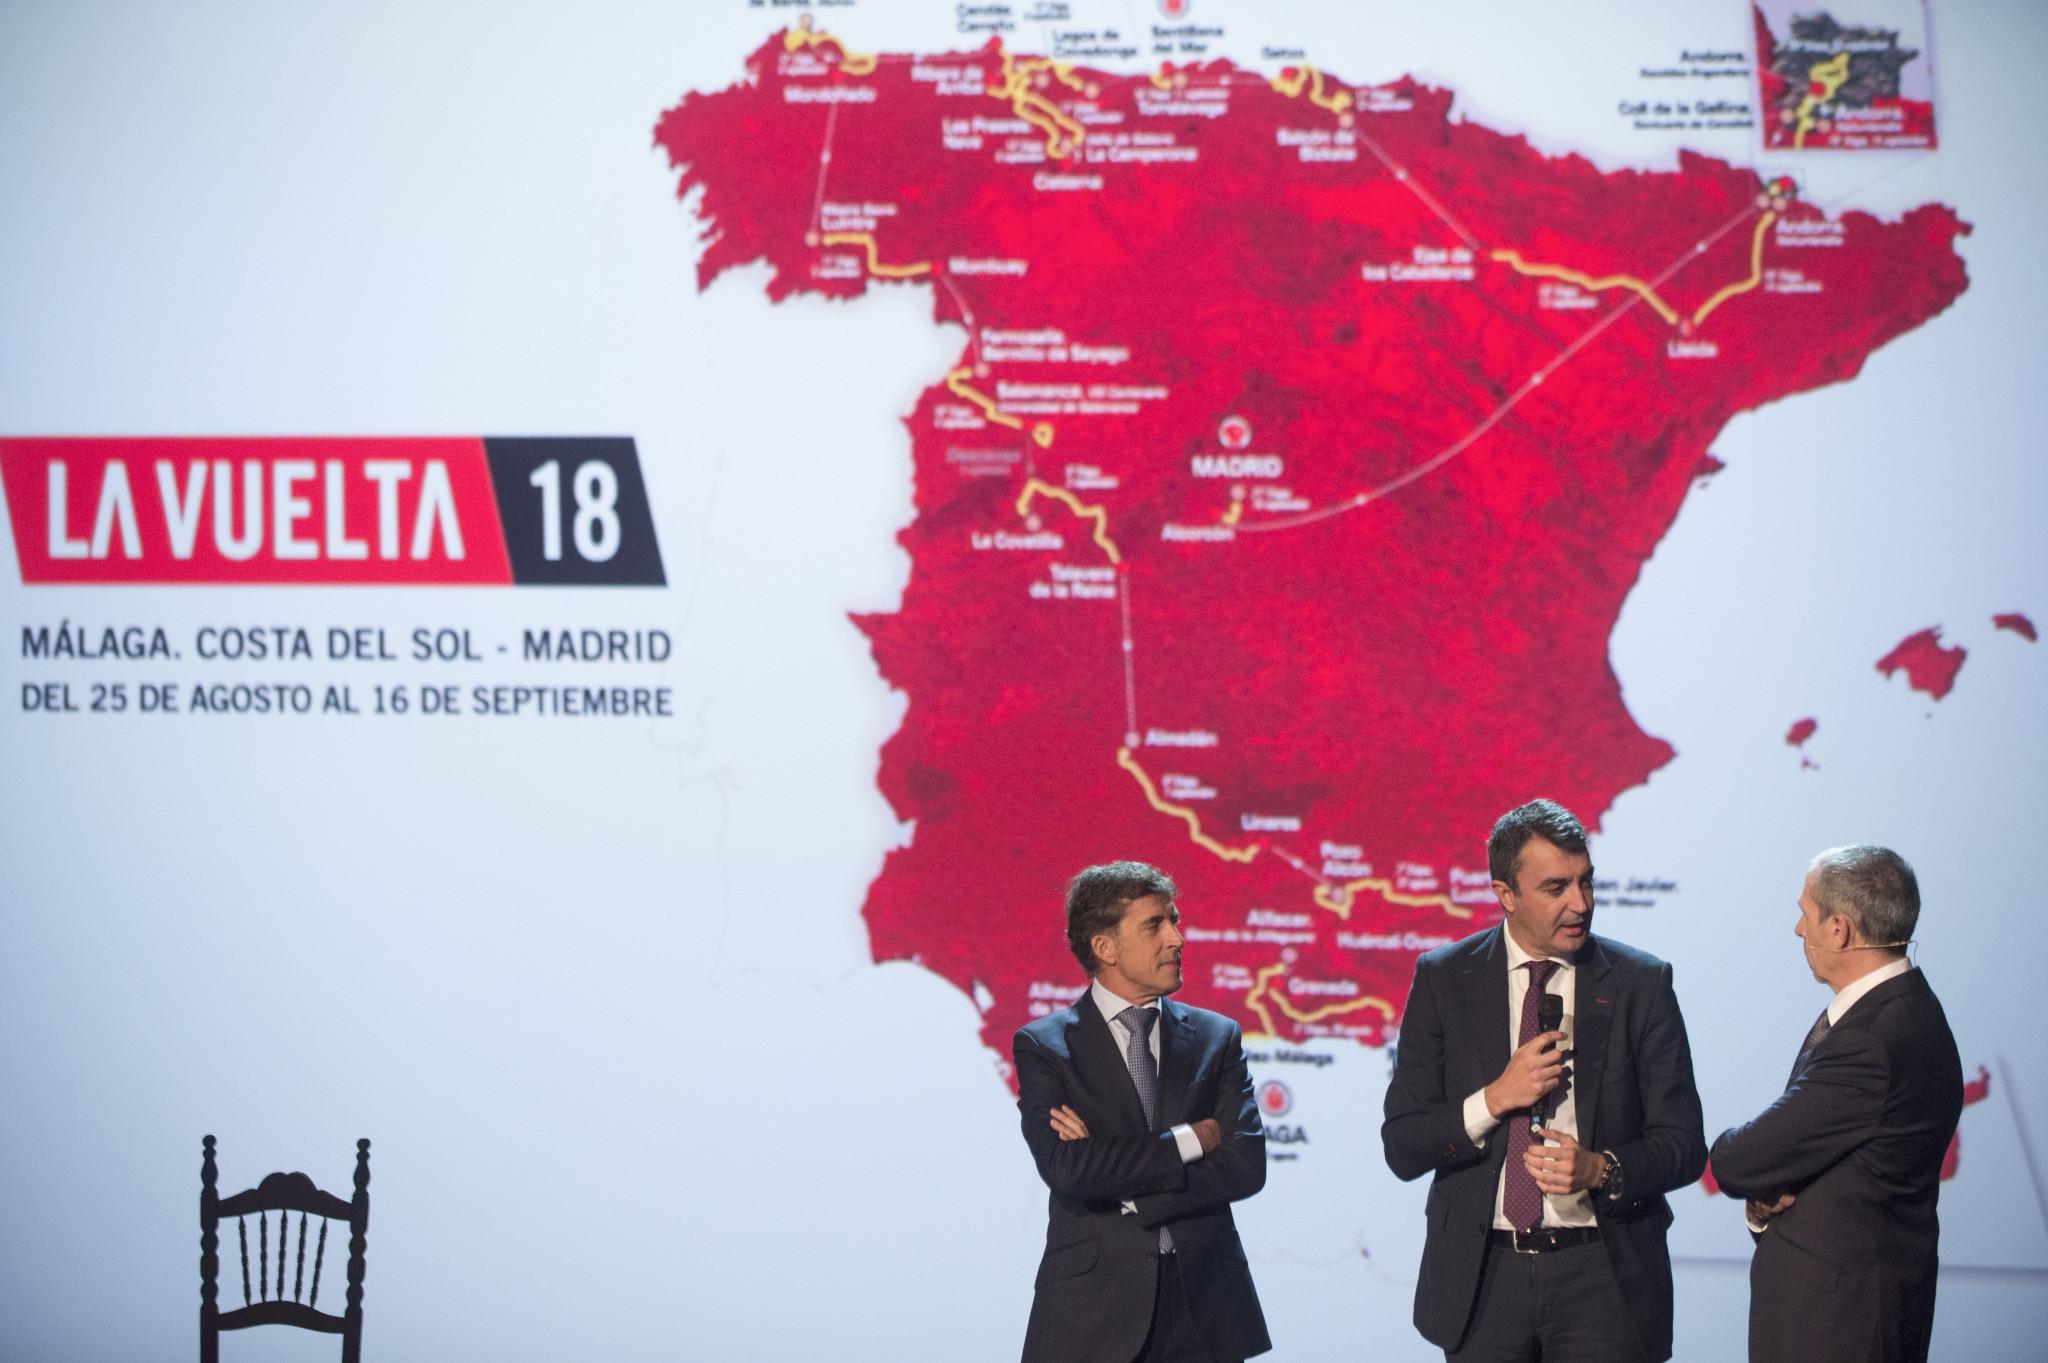 Organisers unveil route for 2018 Vuelta a España